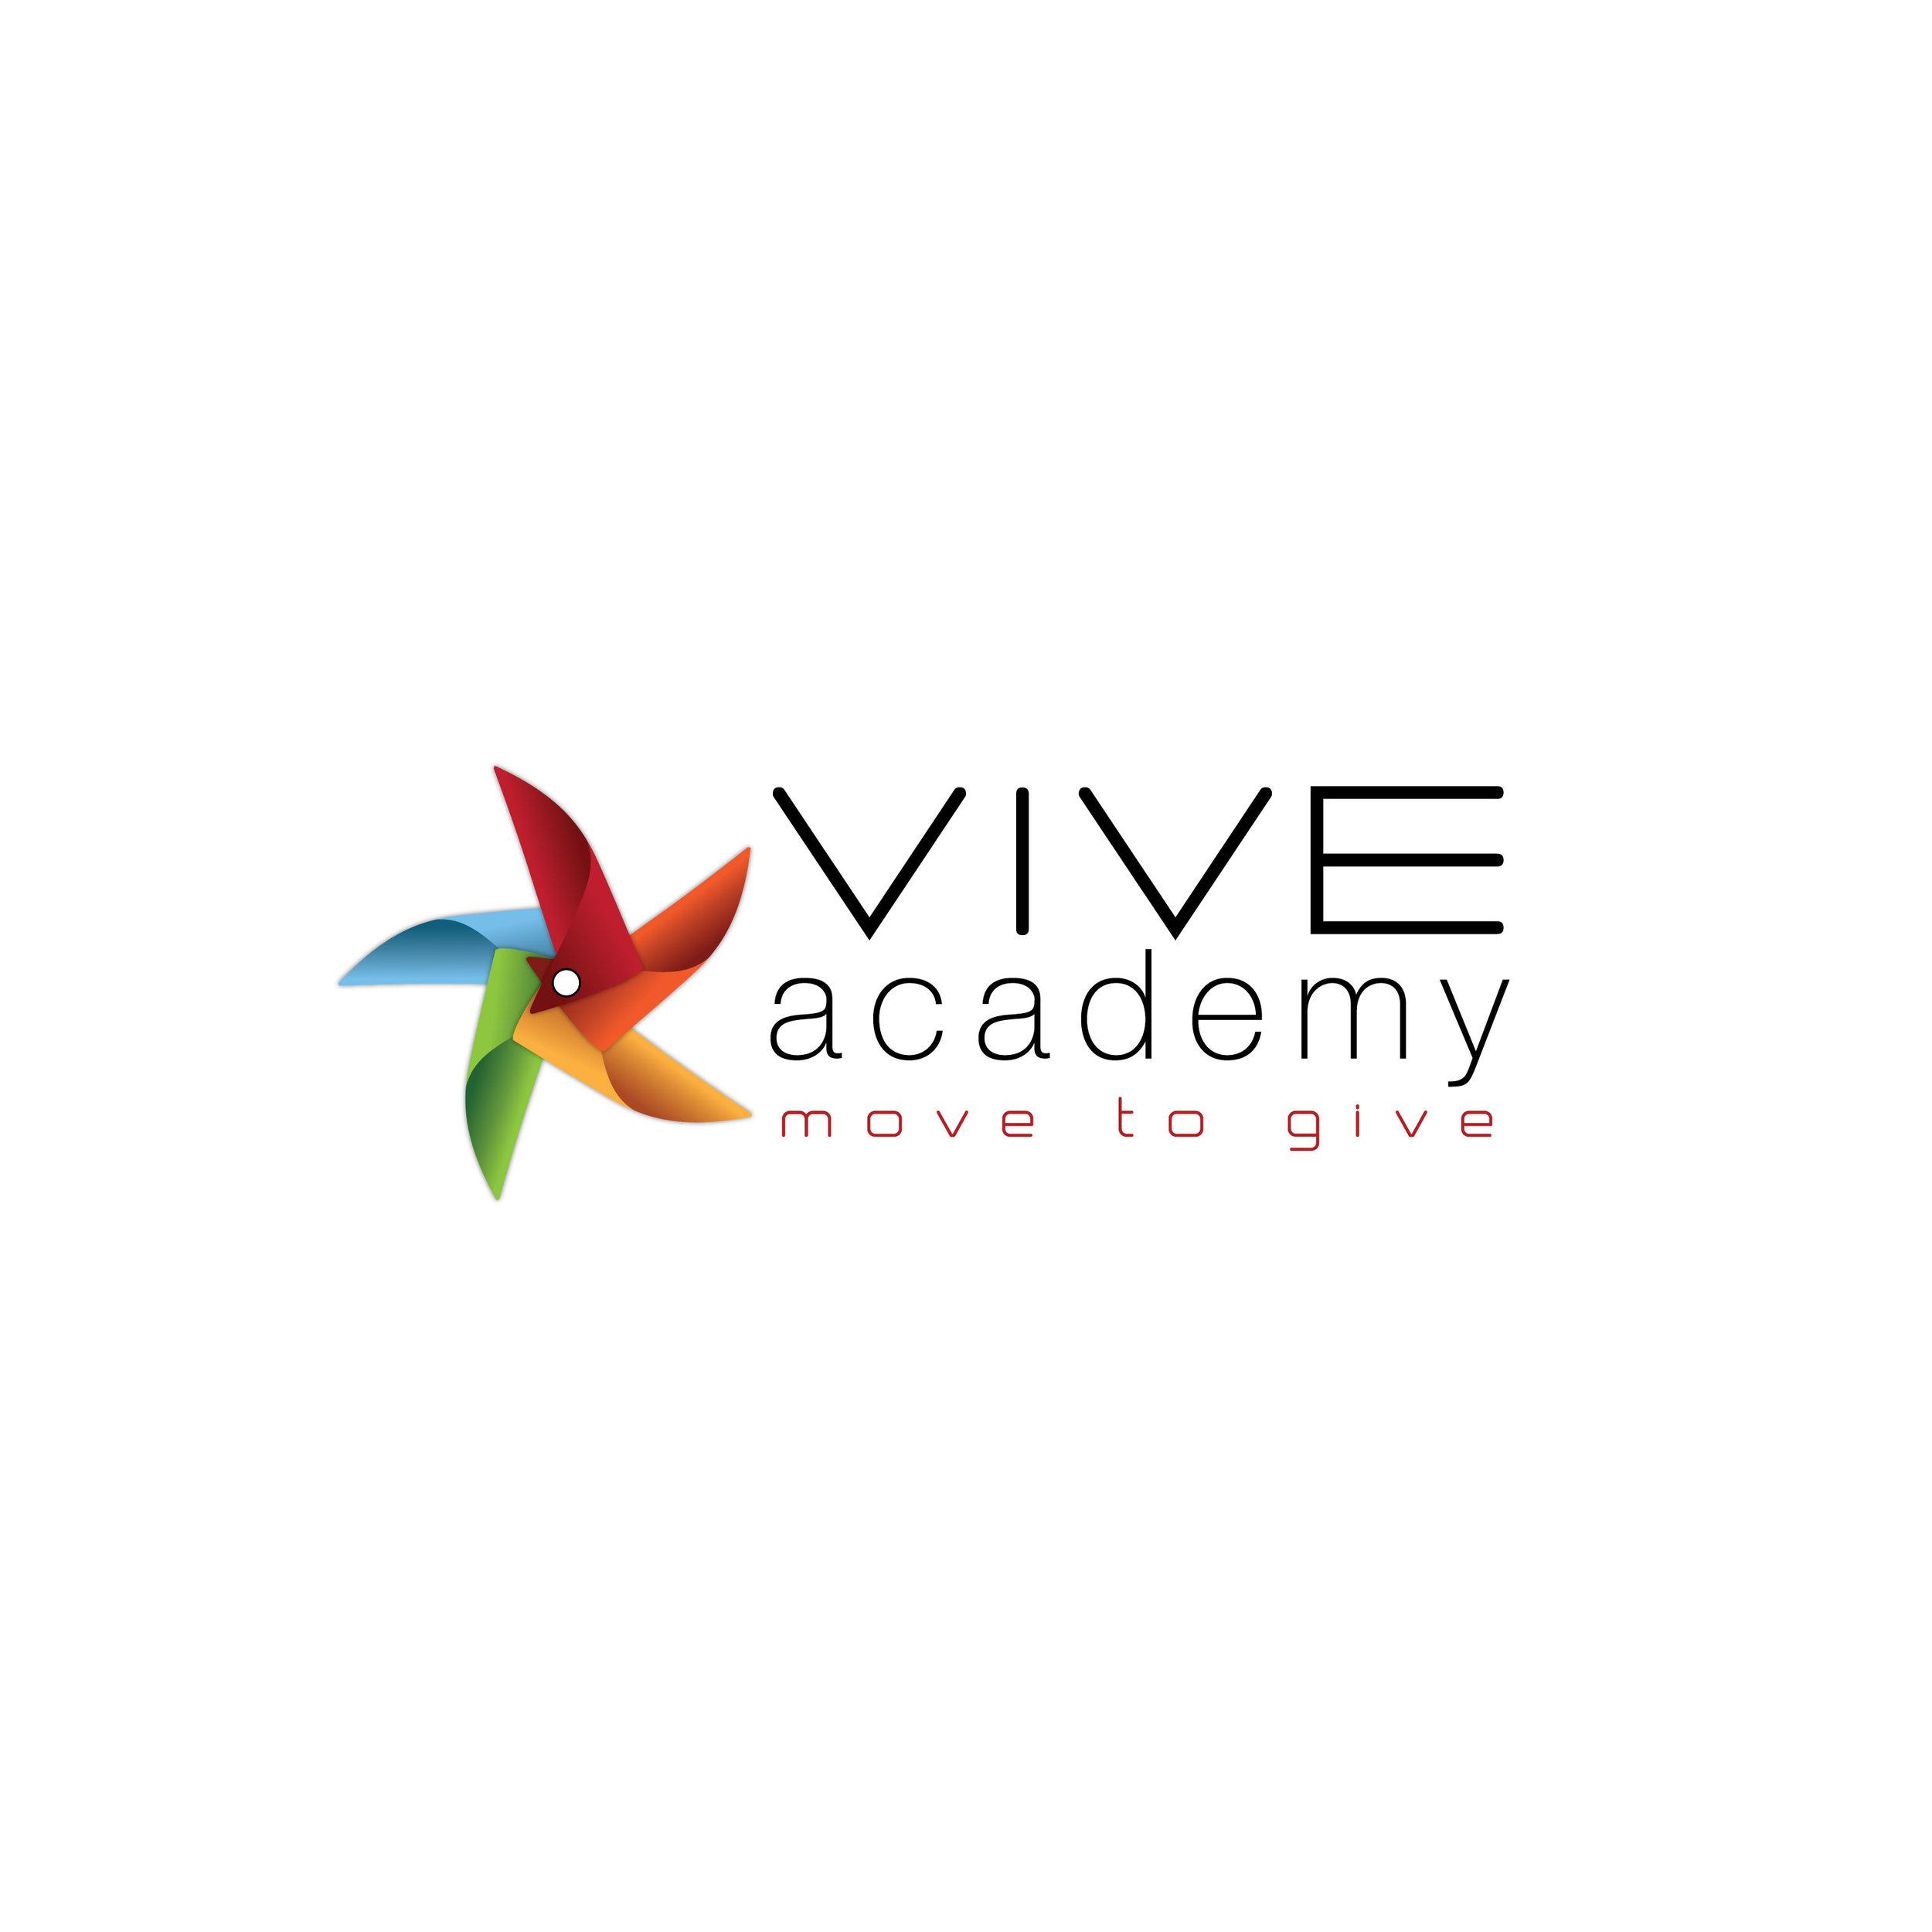 Vive academy logo.jpg